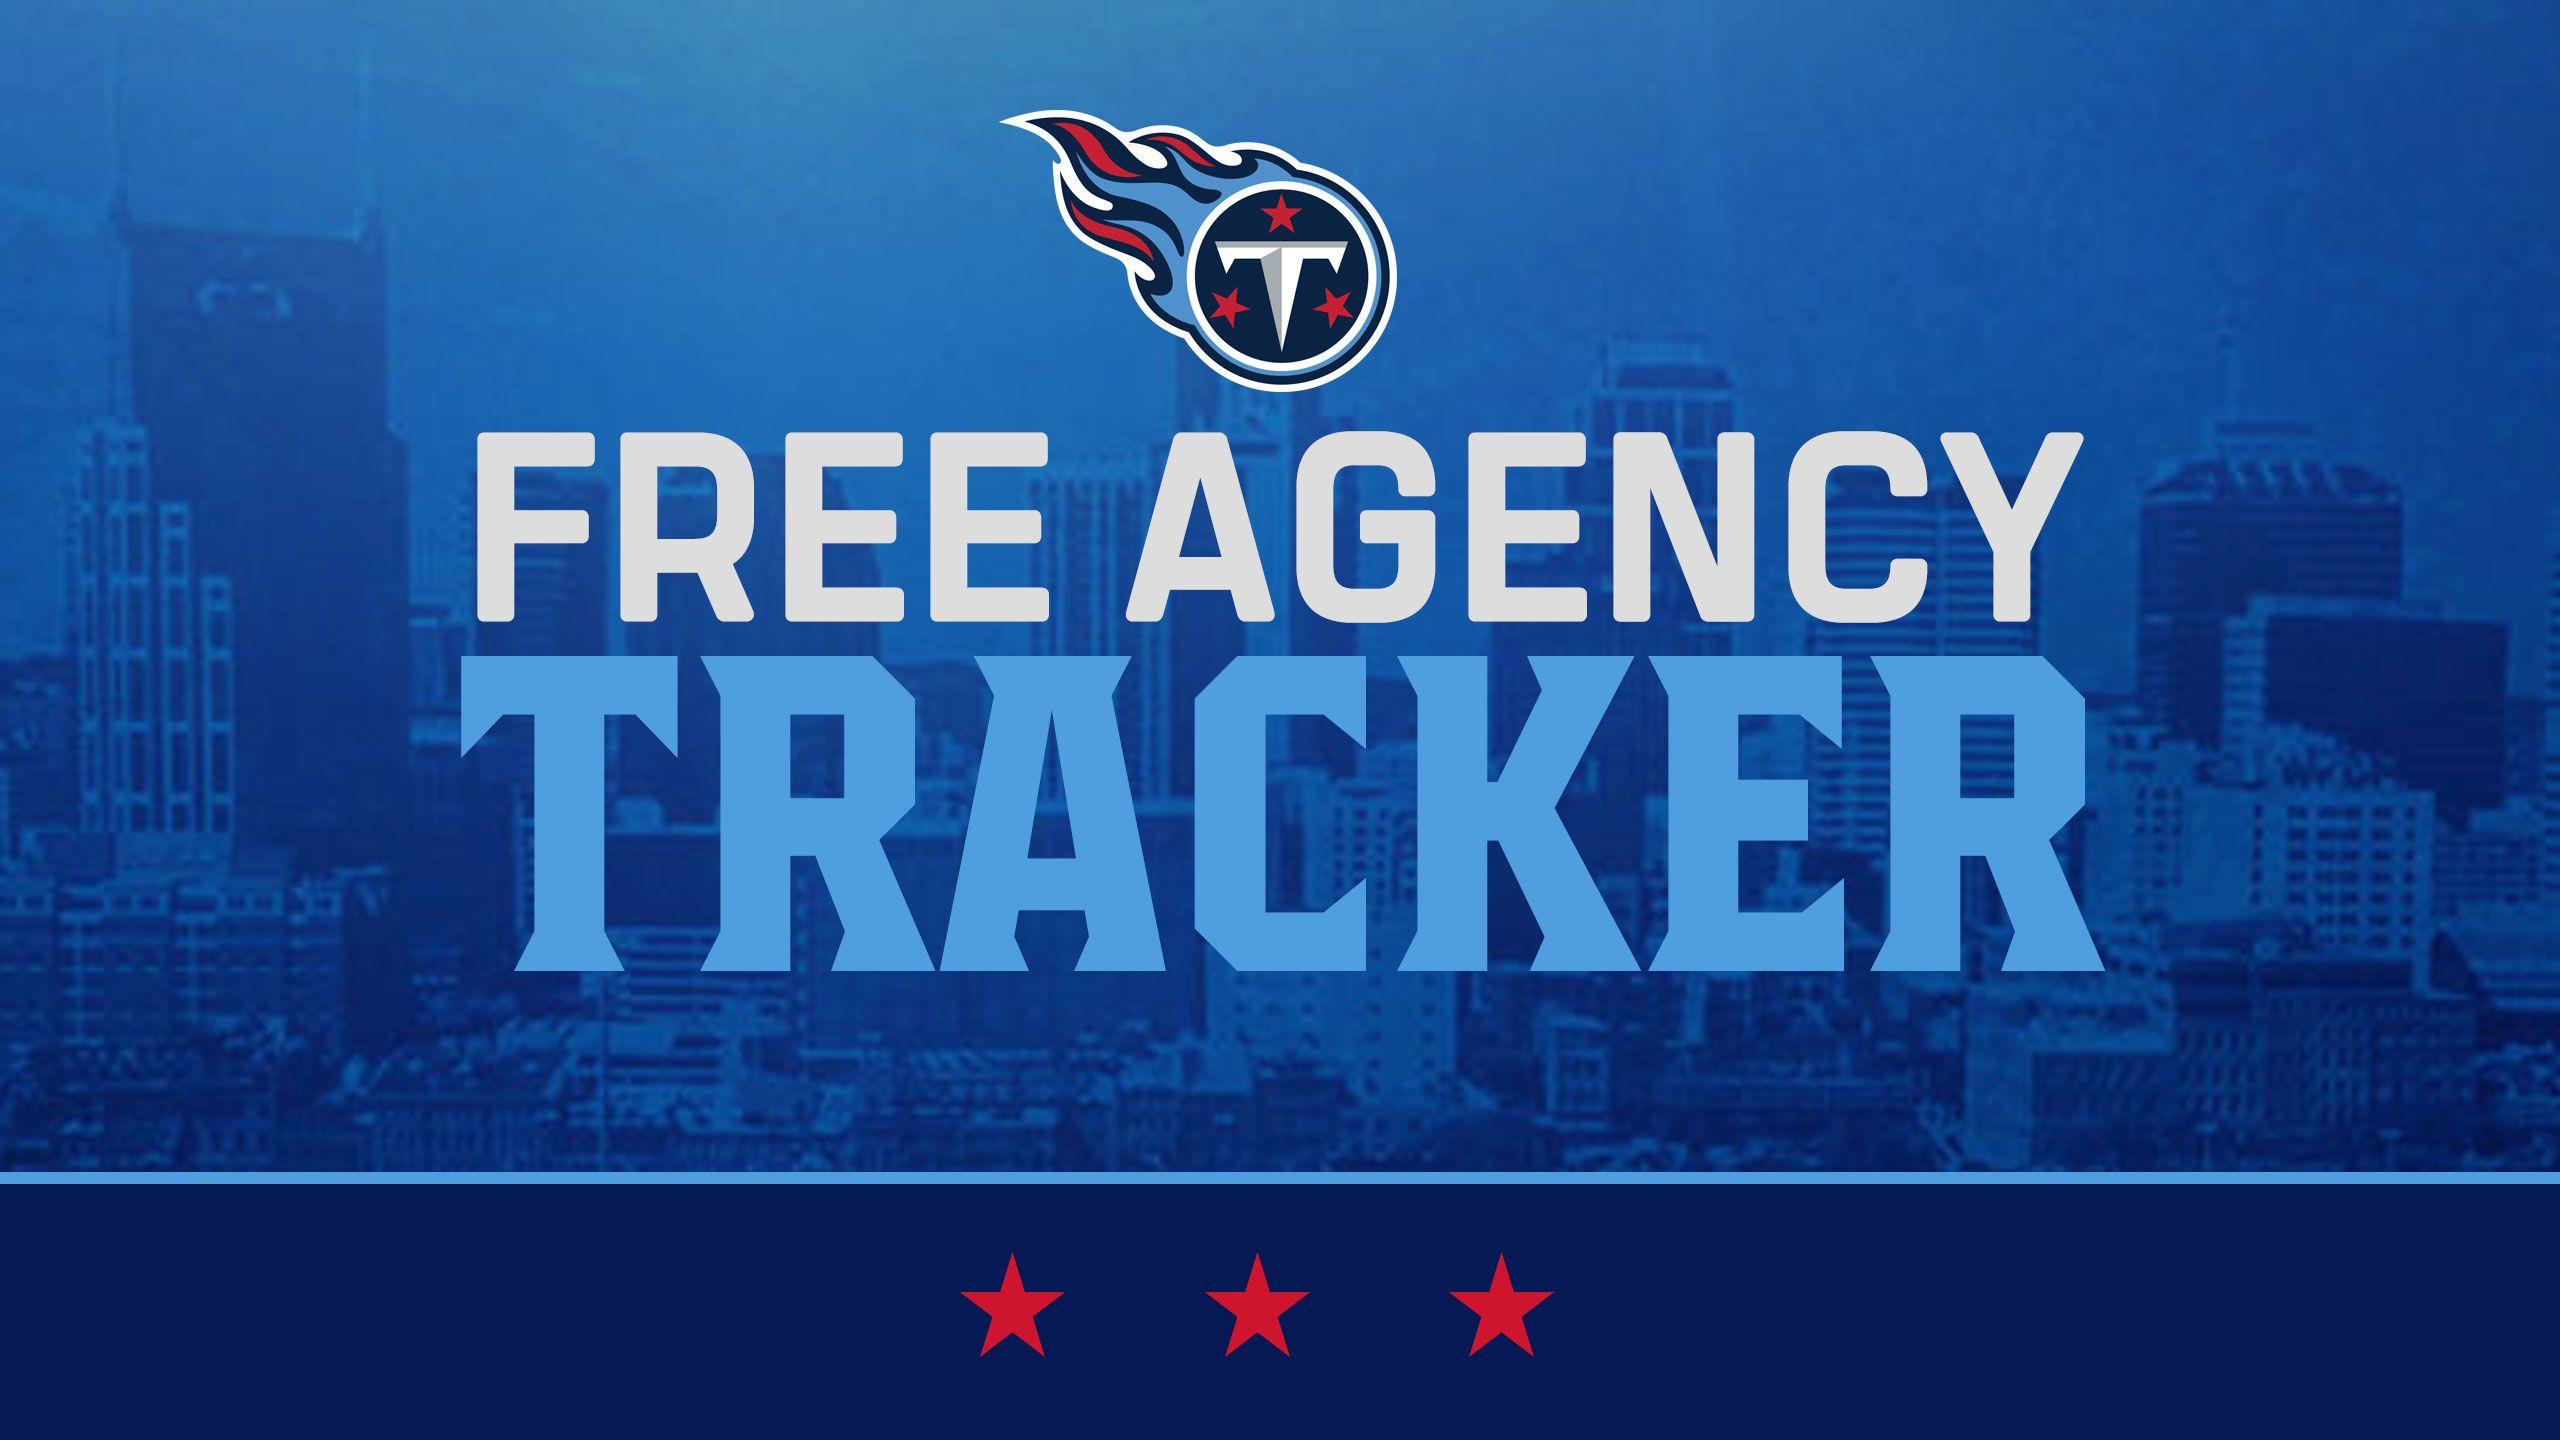 Free Agency Tracker